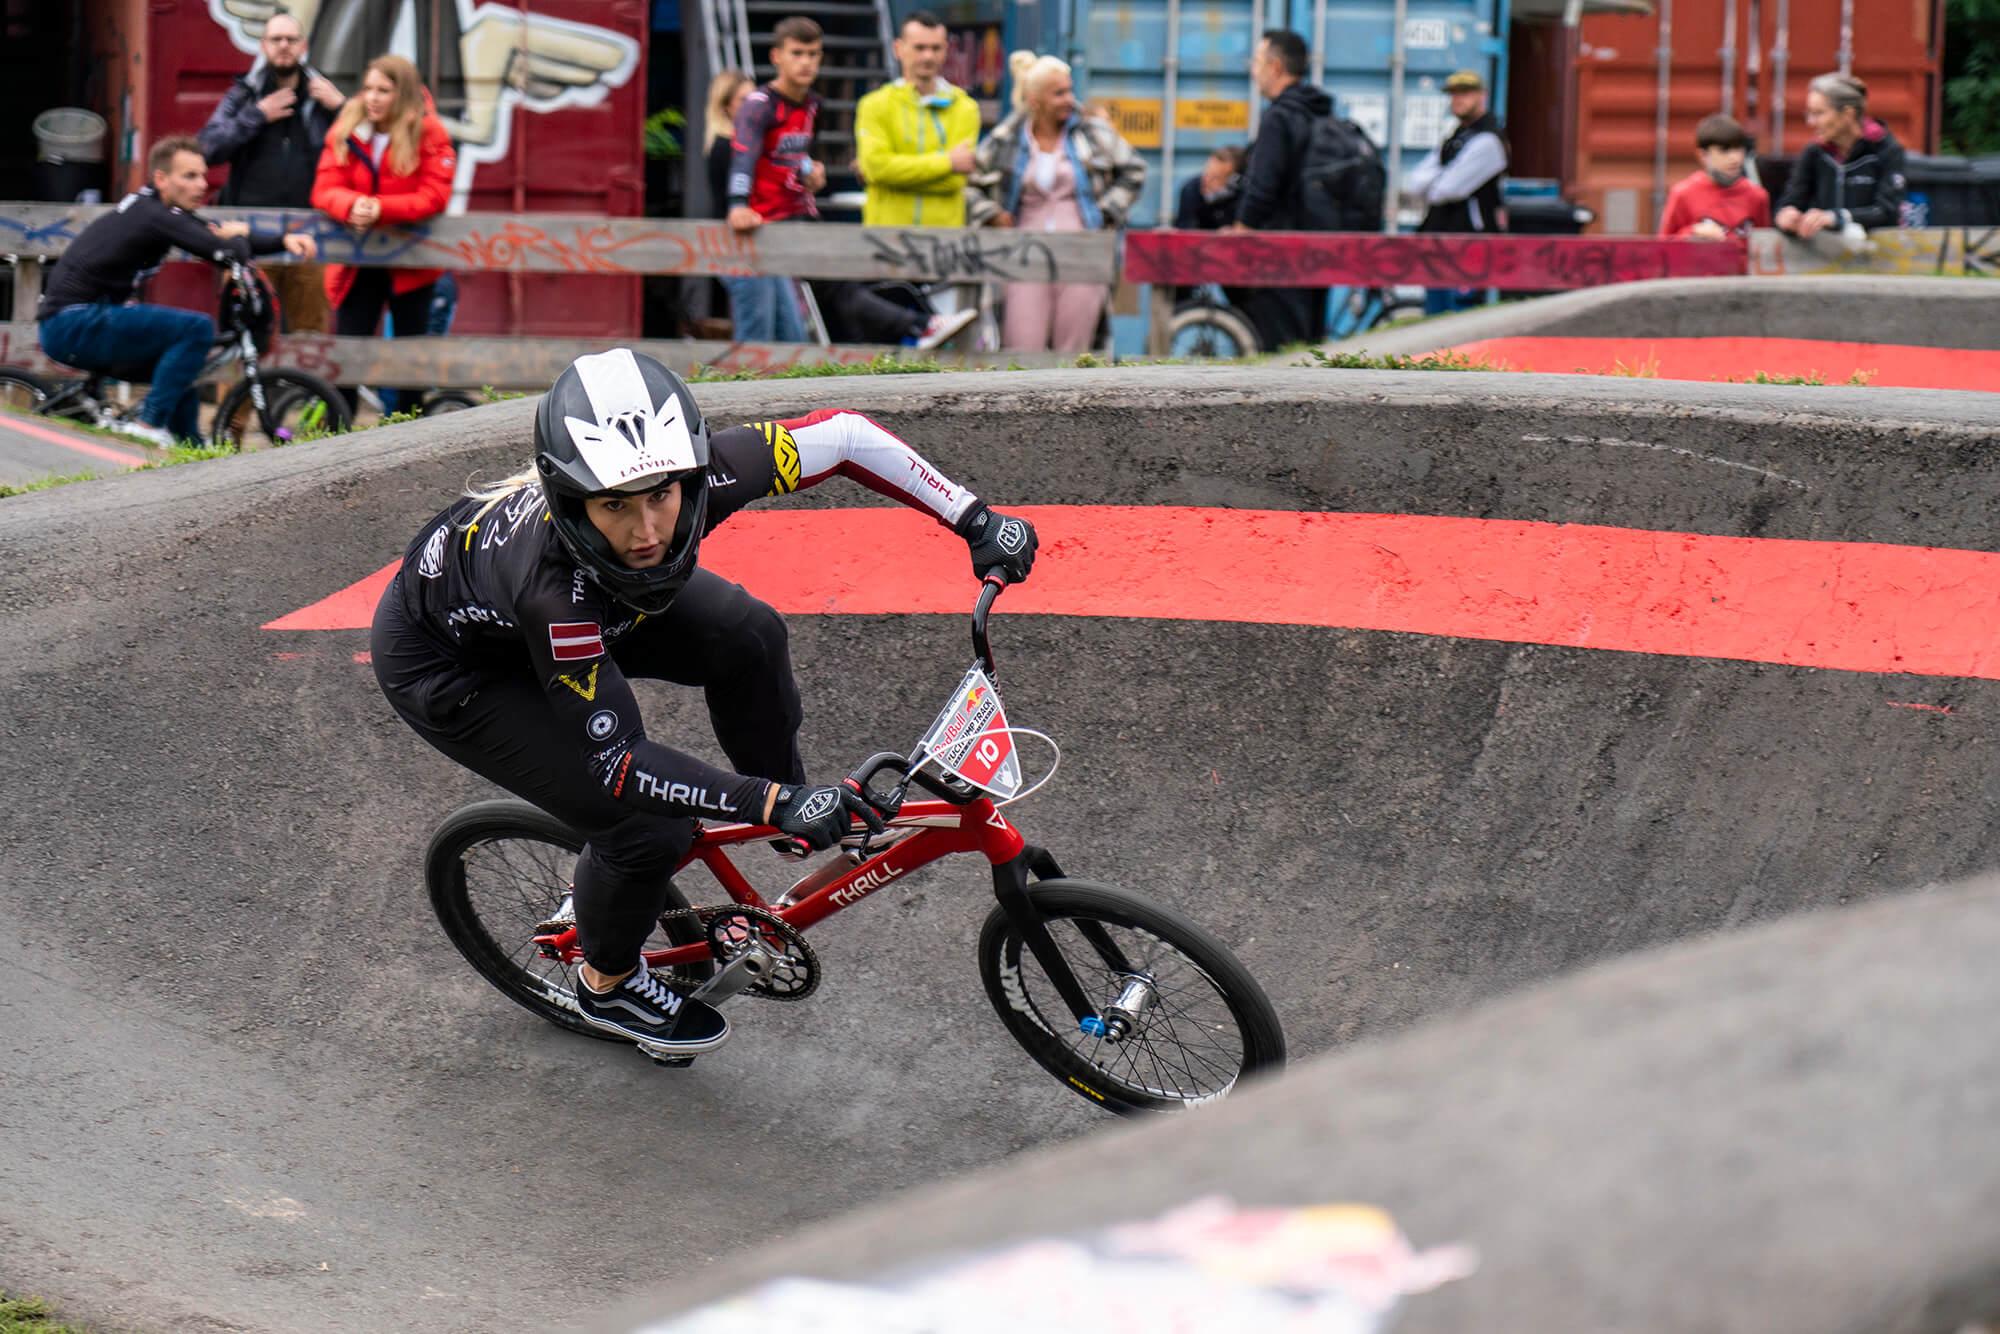 Red Bull Pump Track Qualifier Mellowpark Aug 2021 - Thomas Dietze